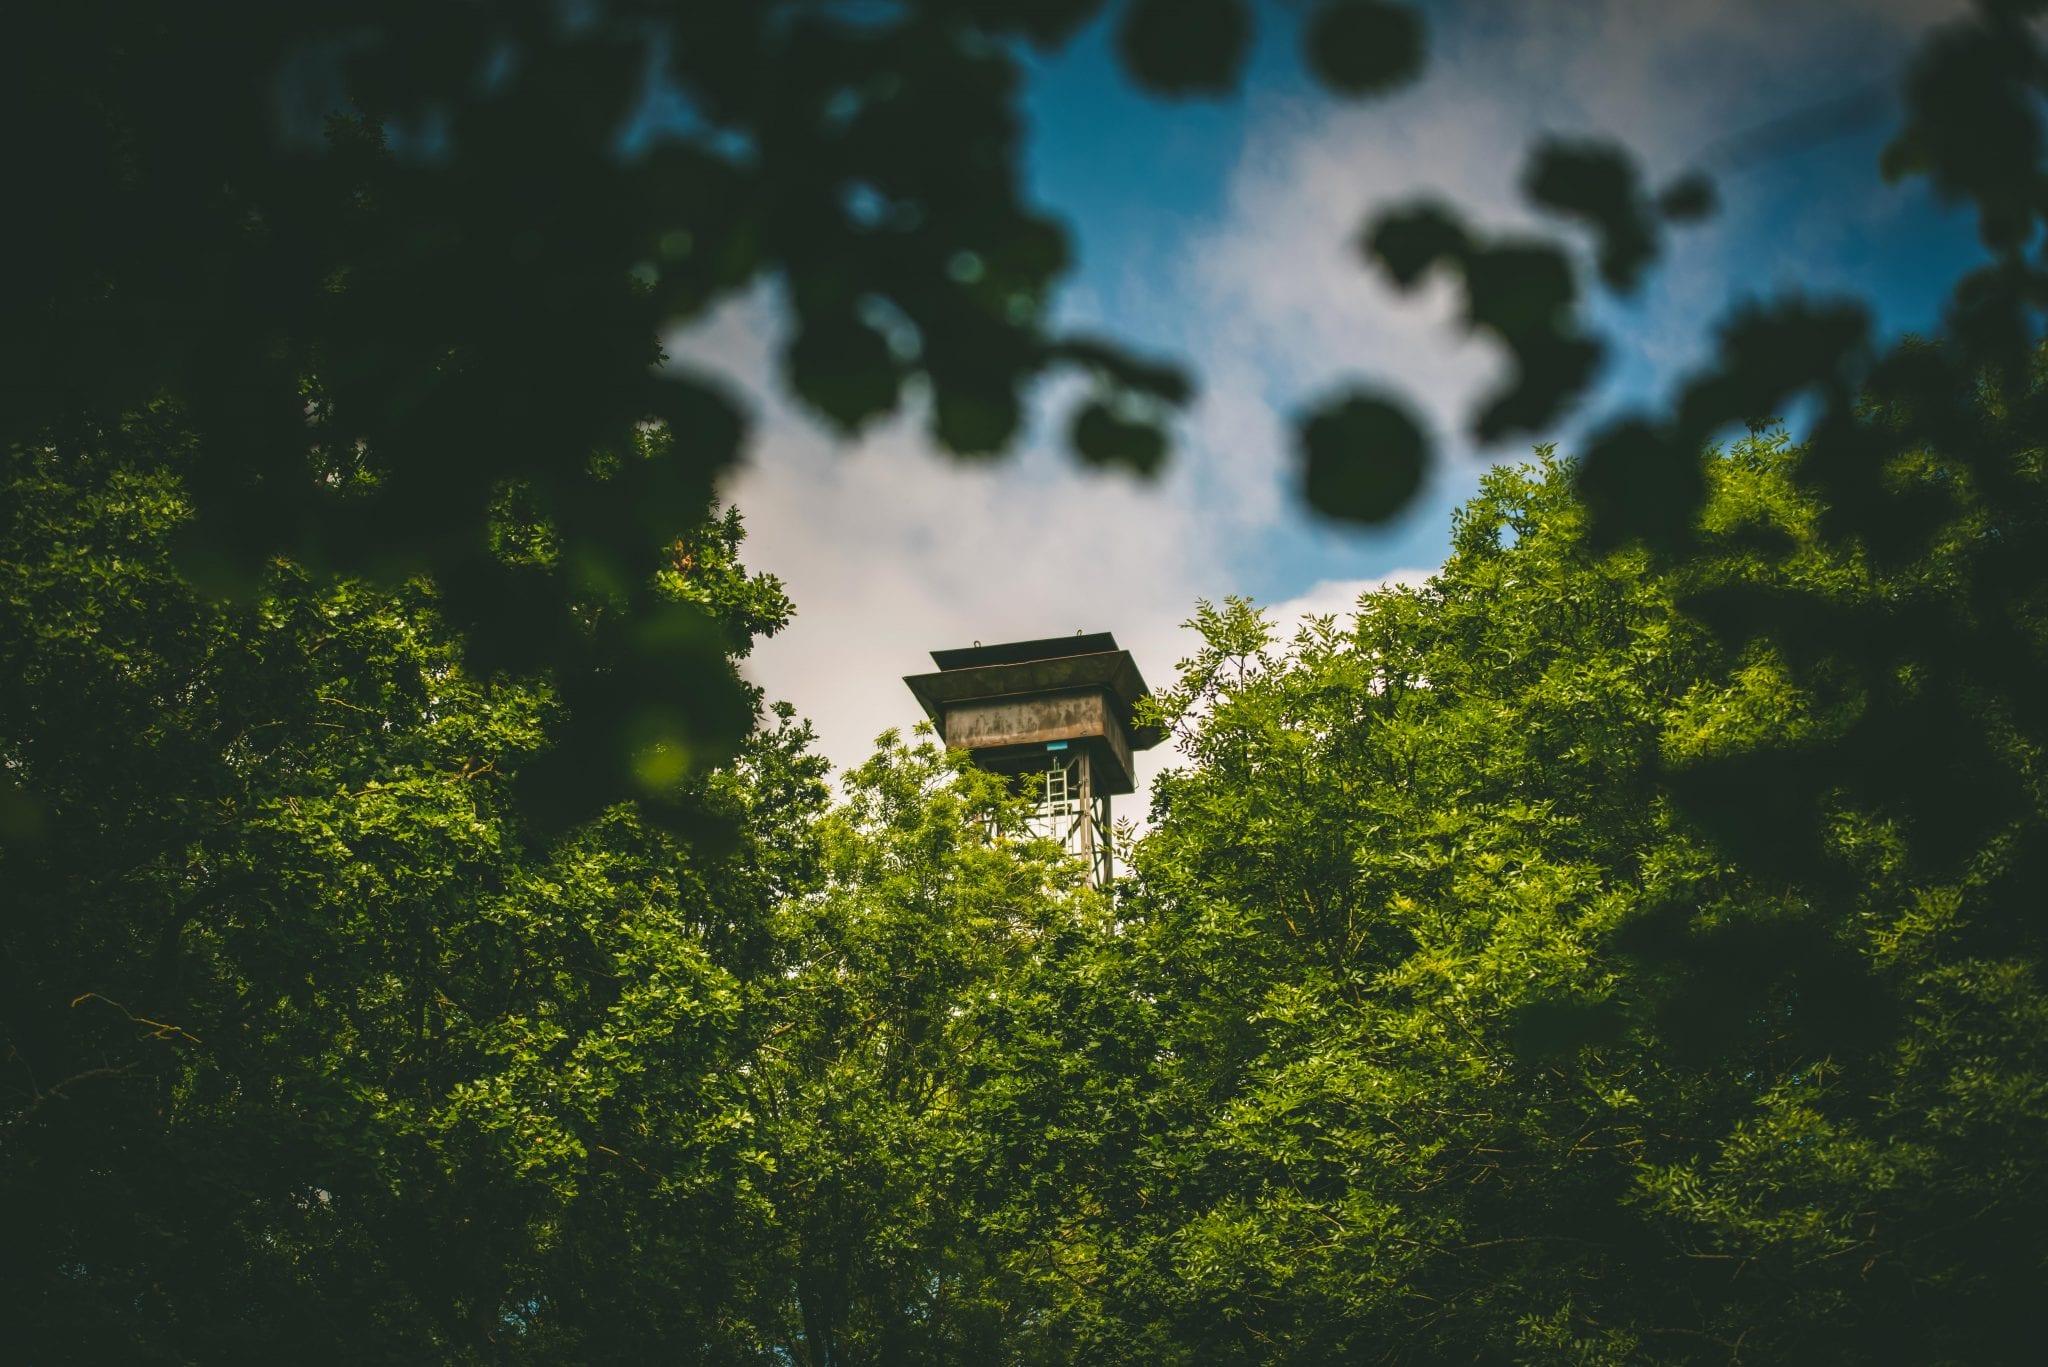 Lady's Wood high tower peeking through the trees